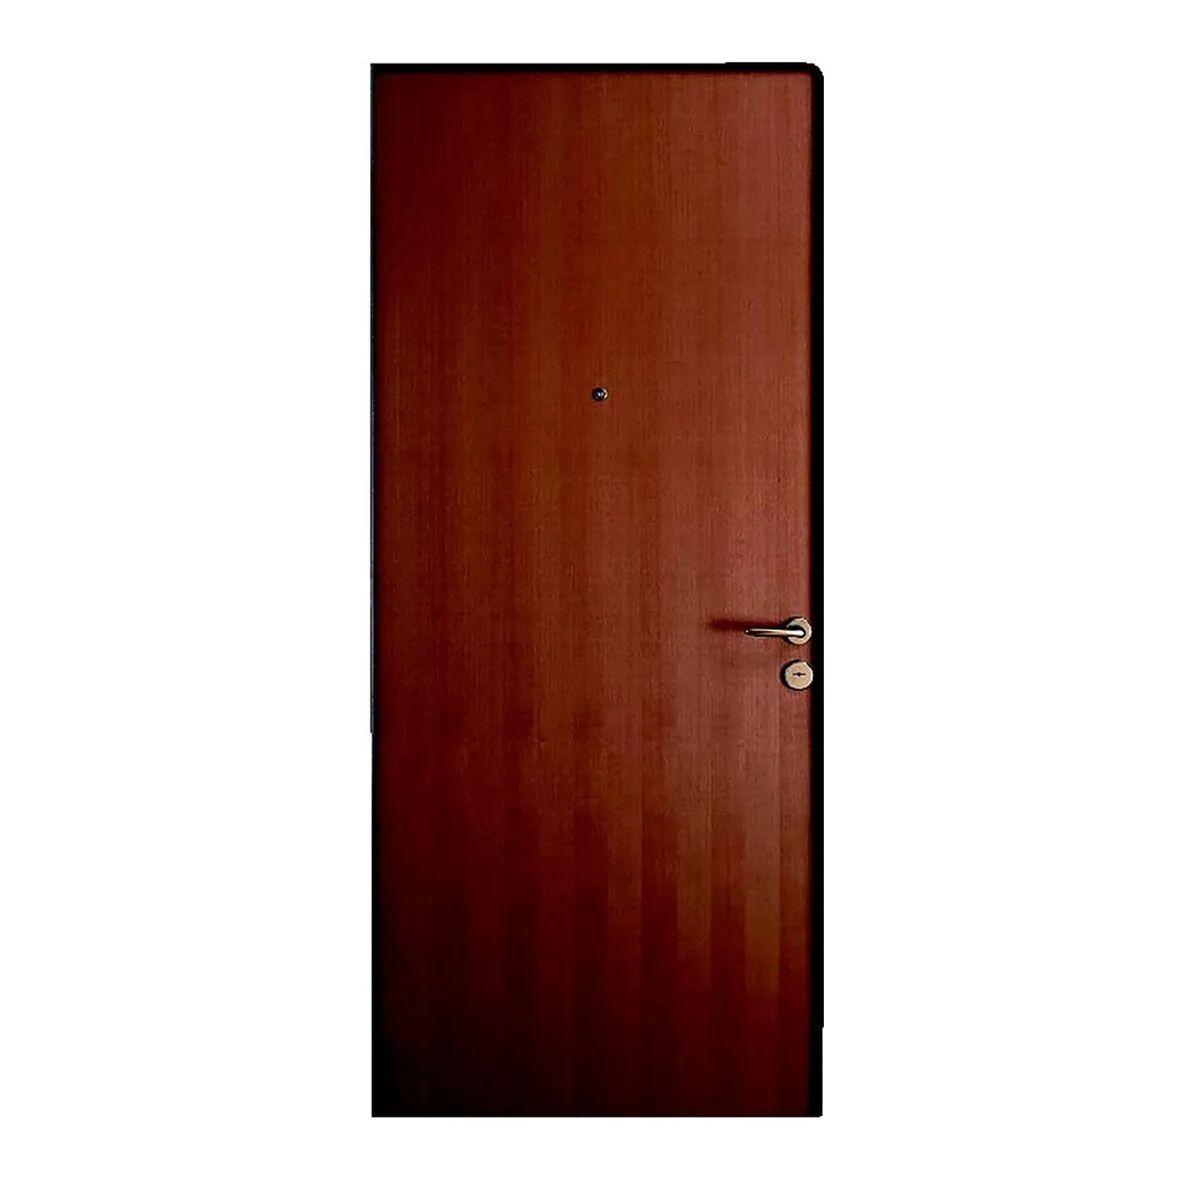 Porta Blindata Steel Apertura Spinta A Destra 210x80 Cm (Hxl)